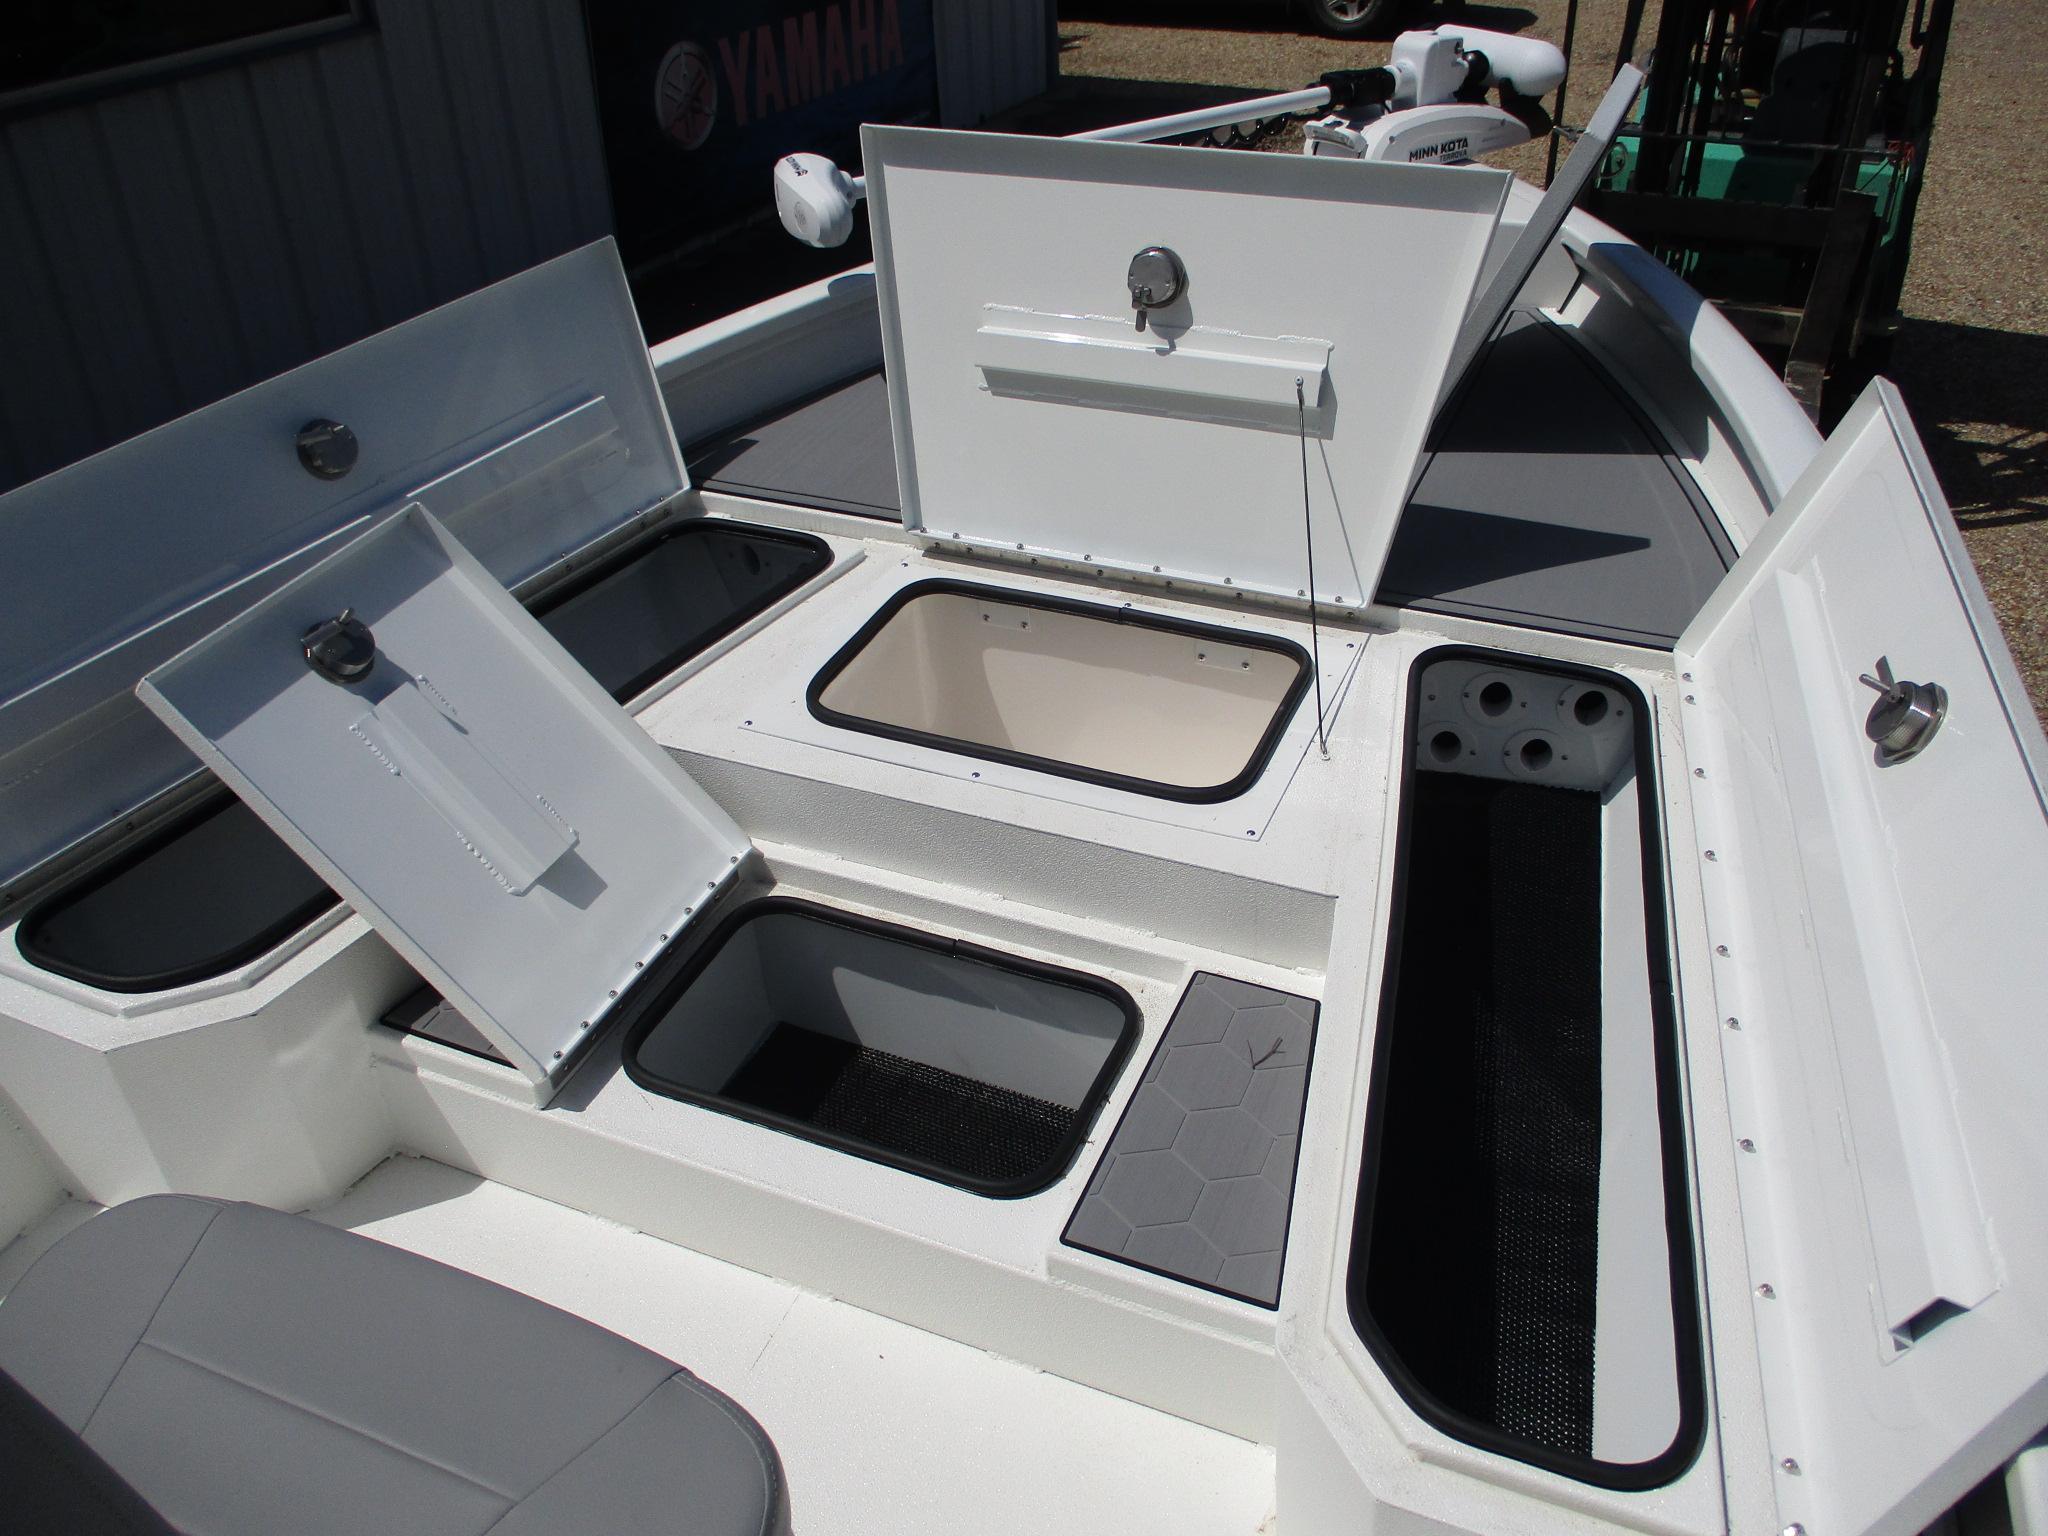 New  2021 21' Avid 21 Mag Aluminum Fish Boat in Slidell, Louisiana